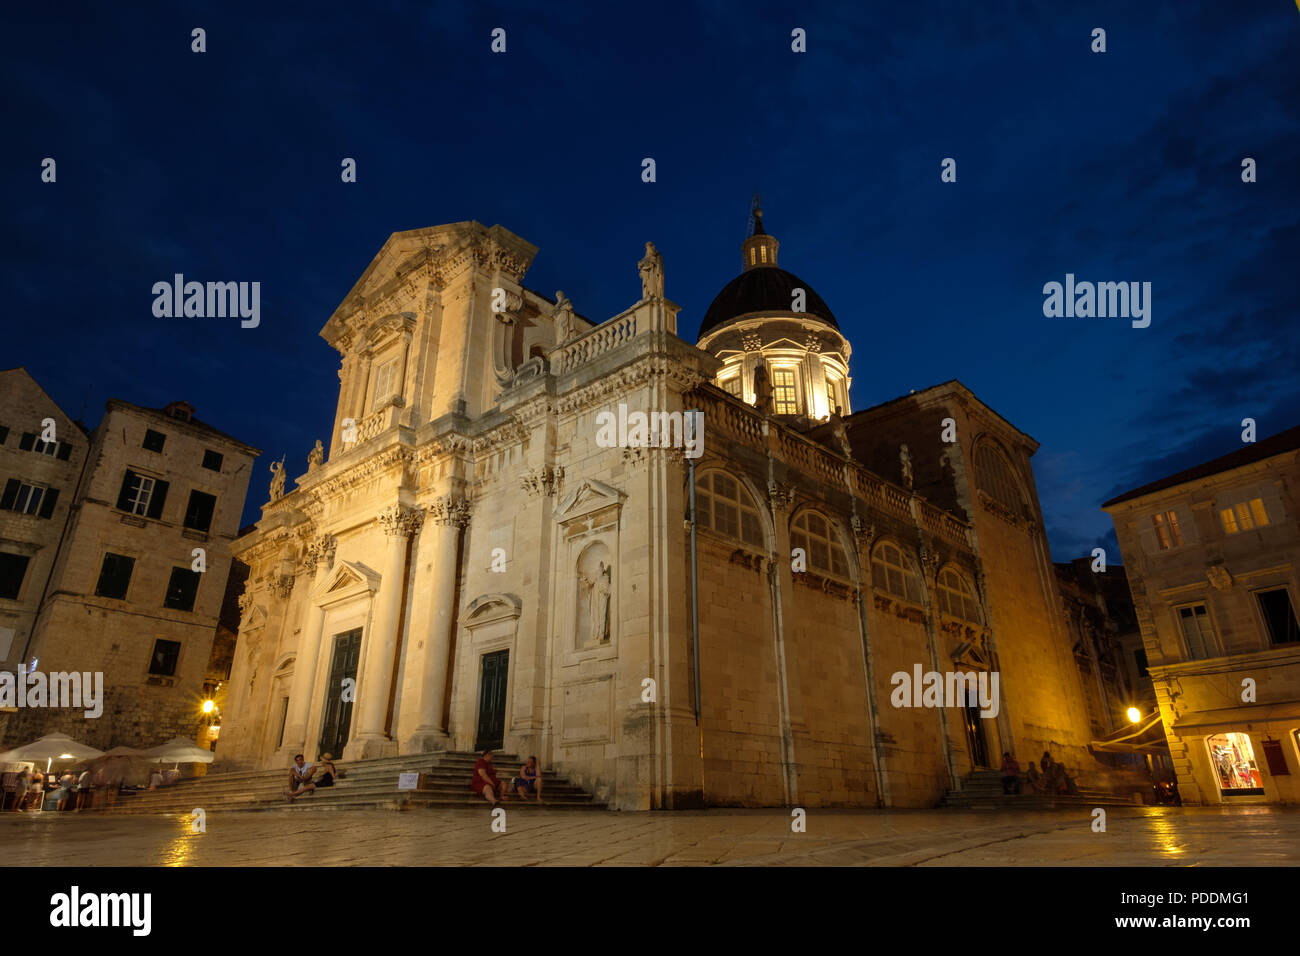 Dubrovnik Cathedral Katedrala Uznesenja Blaa Ene Djevice Marije